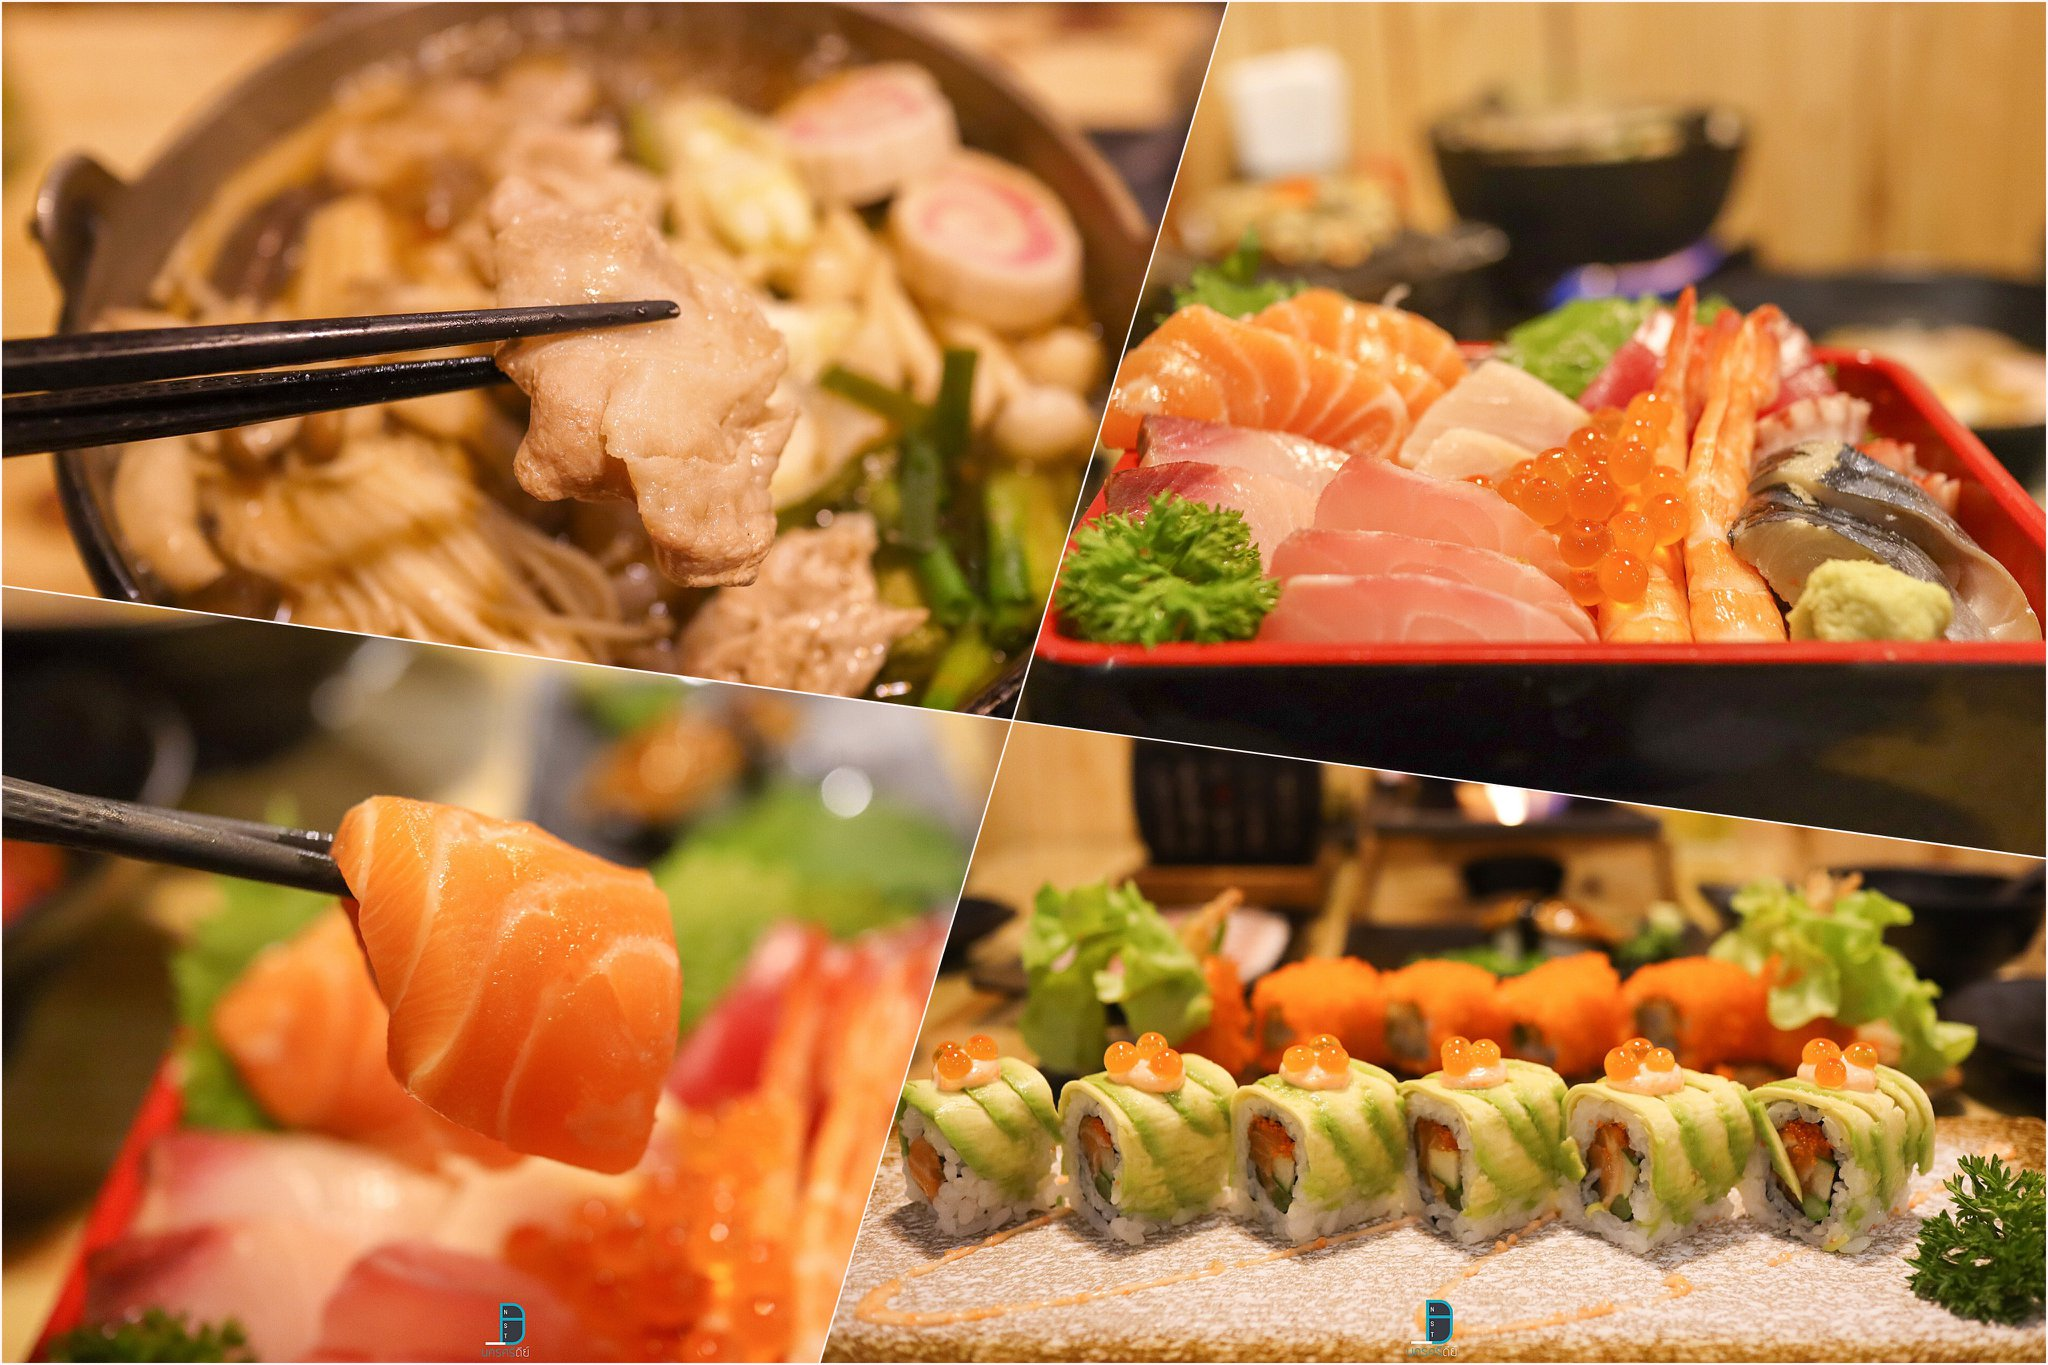 24.-Ginza-Izakaya-ร้านอาหารญี่ปุ่นนน รายละเอียด-คลิก แหล่งท่องเที่ยว,นครศรี,จุดเช็คอิน,จุดถ่ายรูป,คาเฟ่,ของกิน,จุดกิน